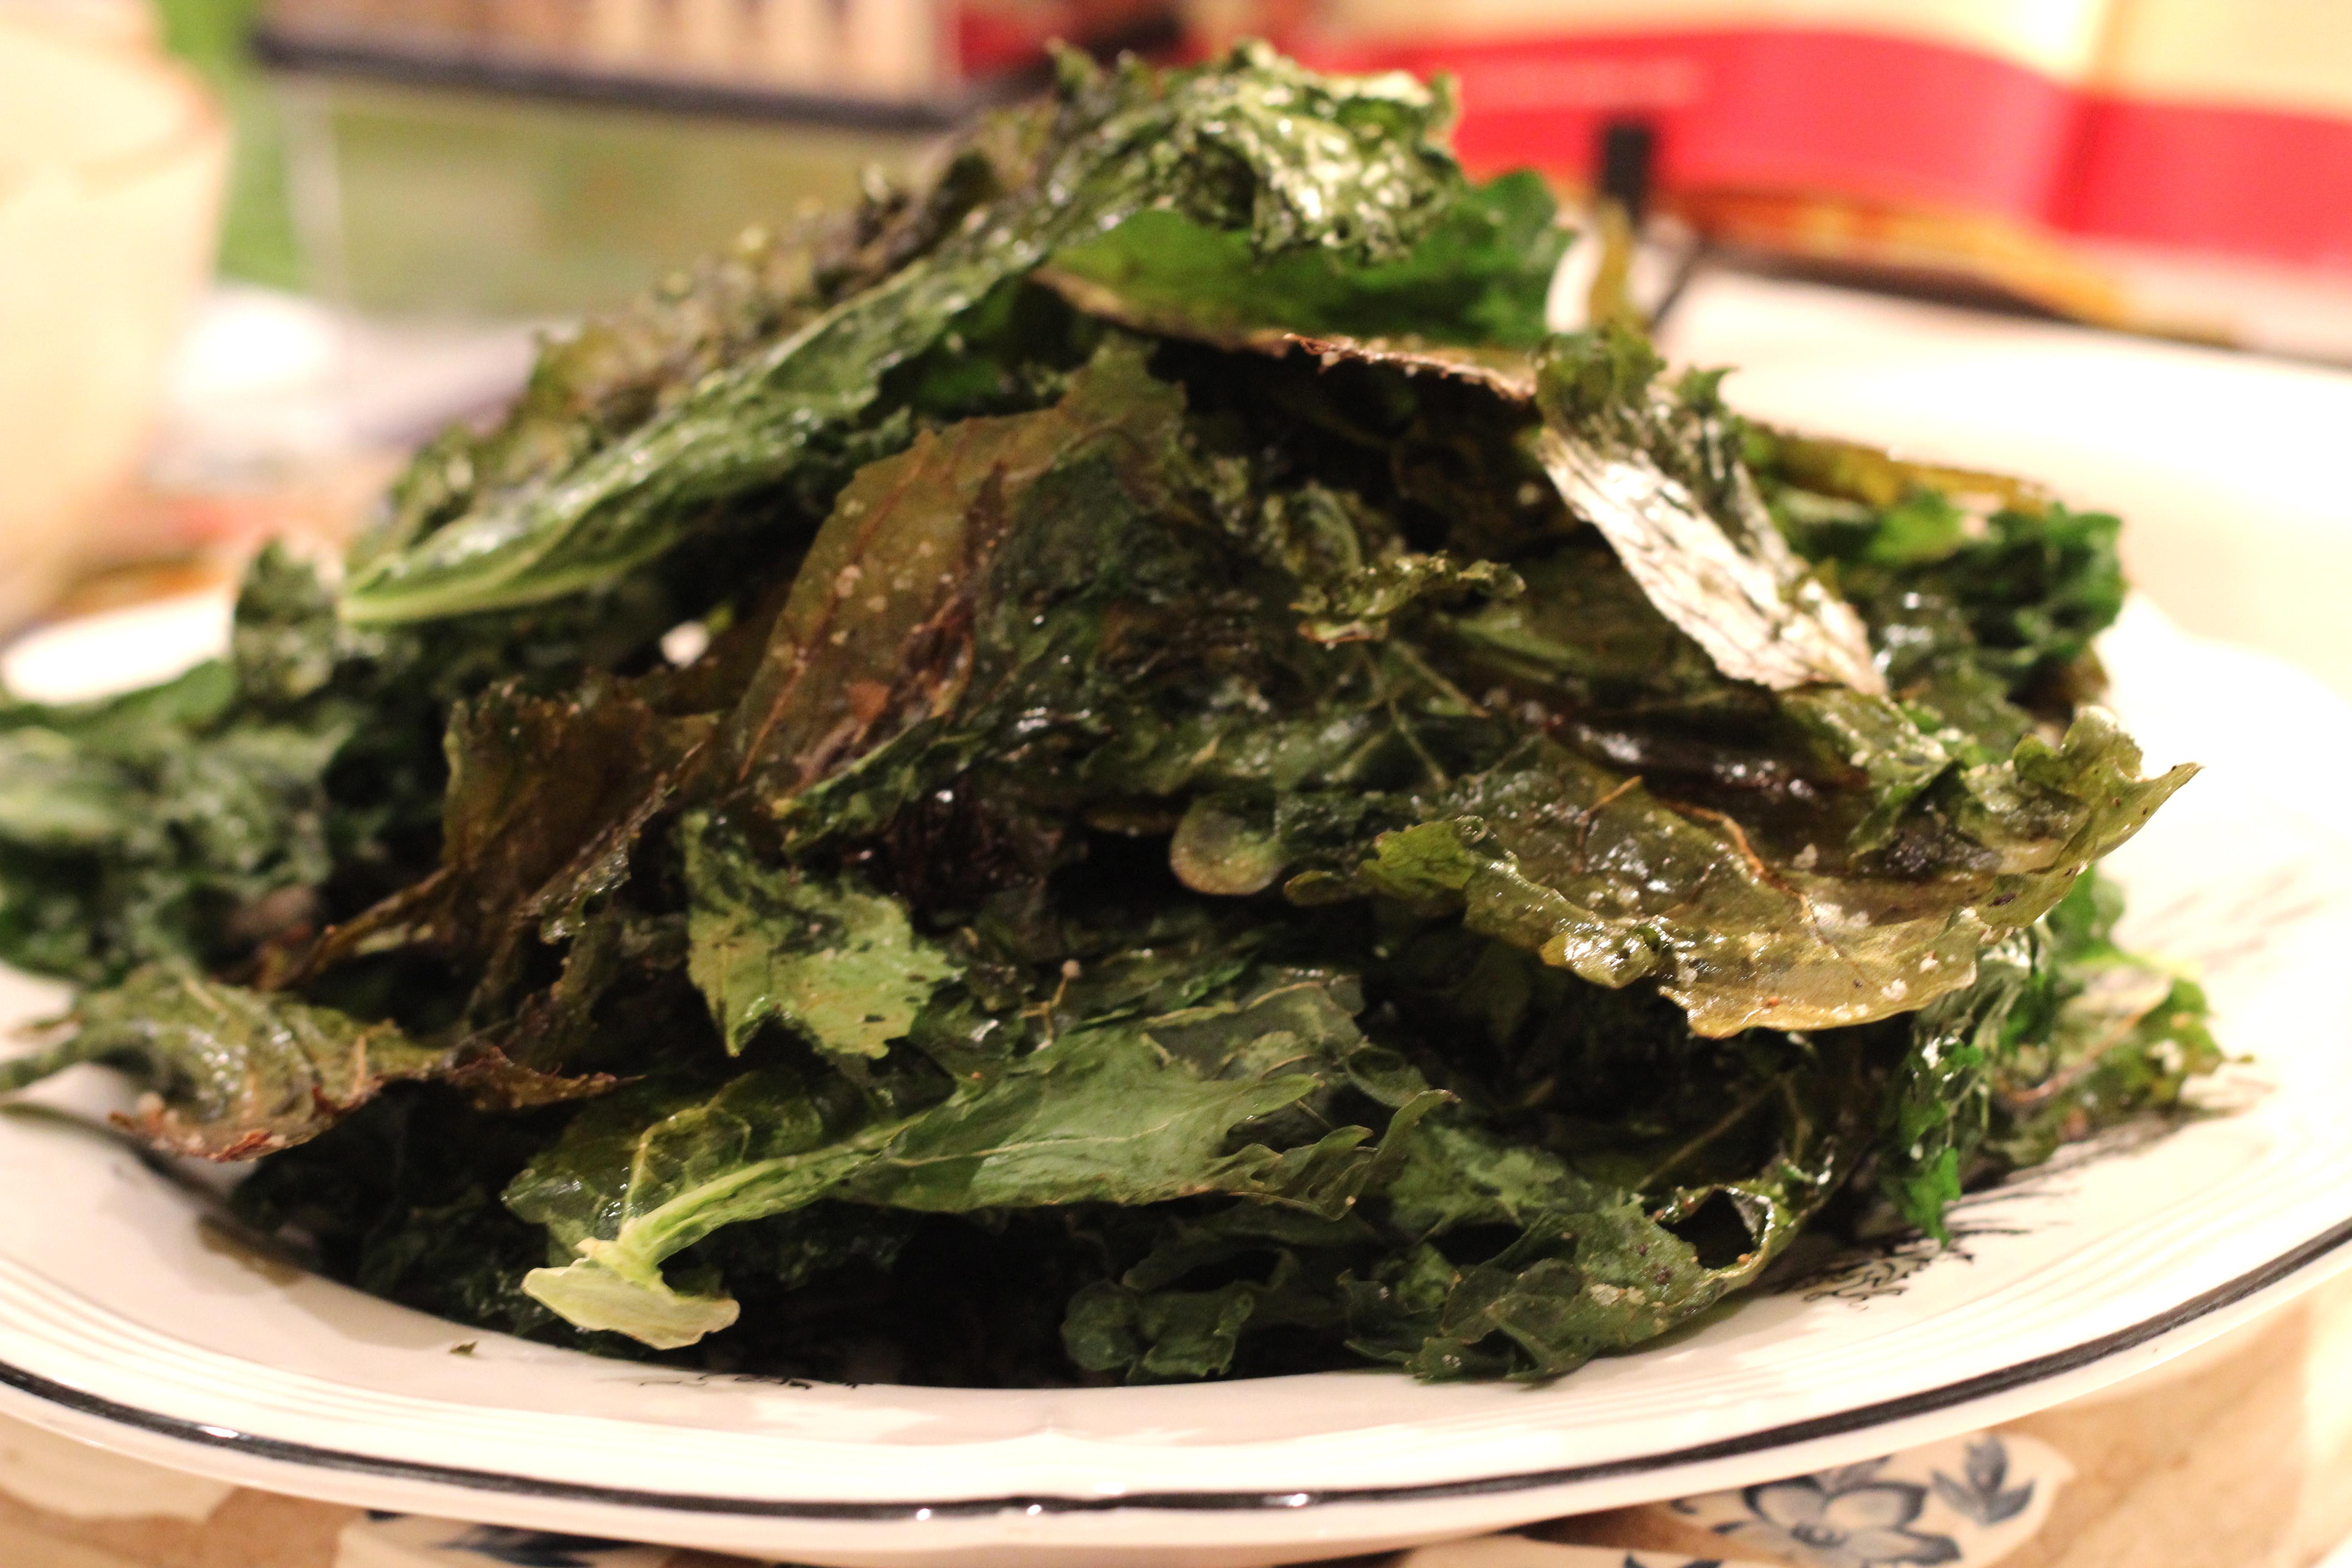 Baked Kale Chips | Deux Maisons